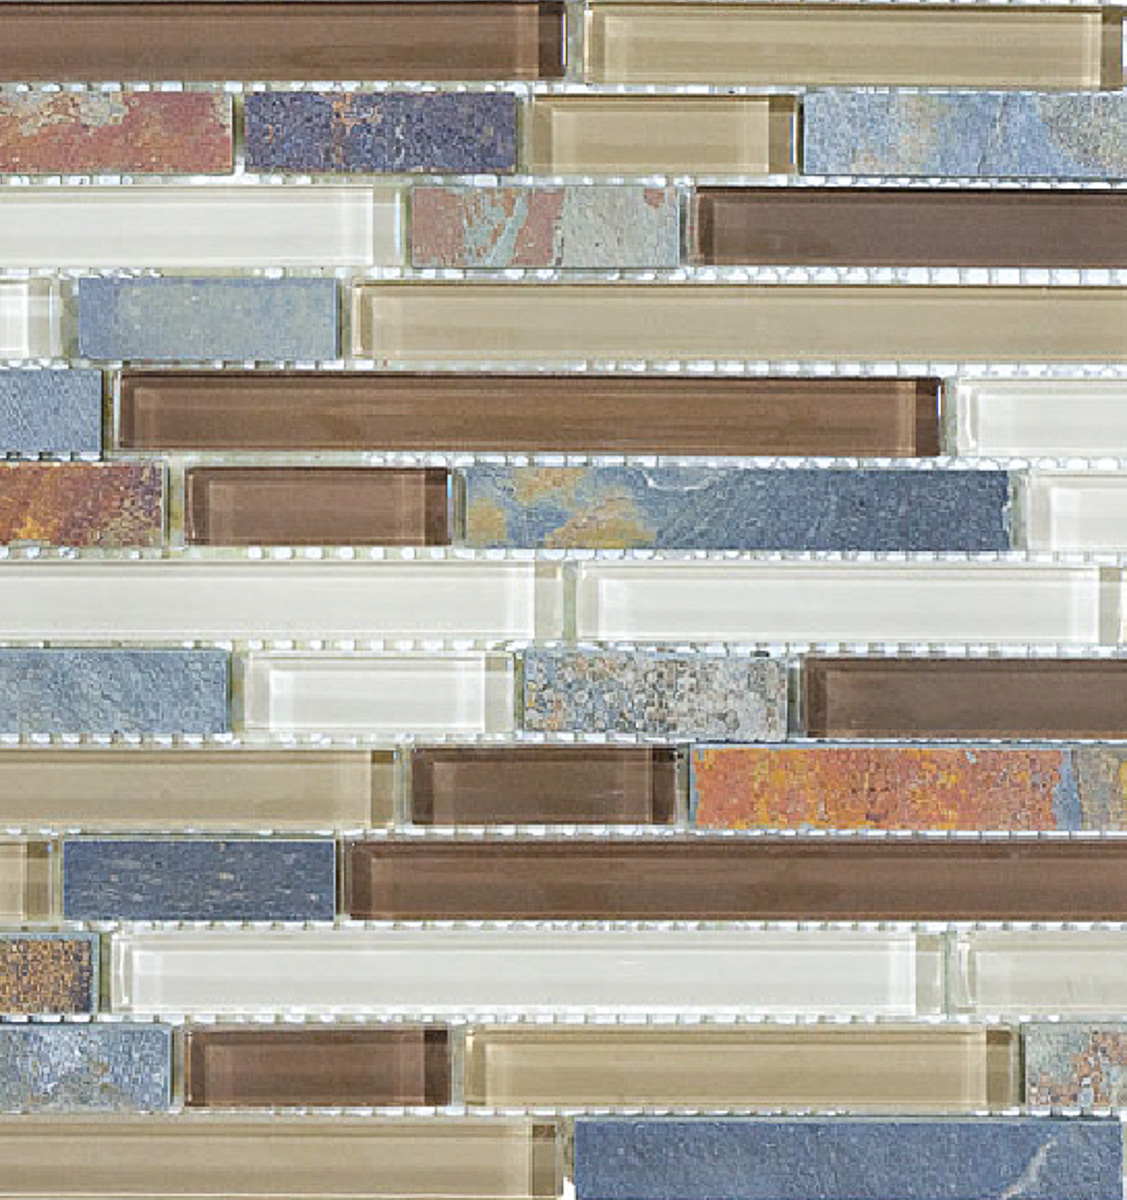 Glass mosaic backsplash iridescent mosaic tile backsplash for Installing glass tile with mesh back